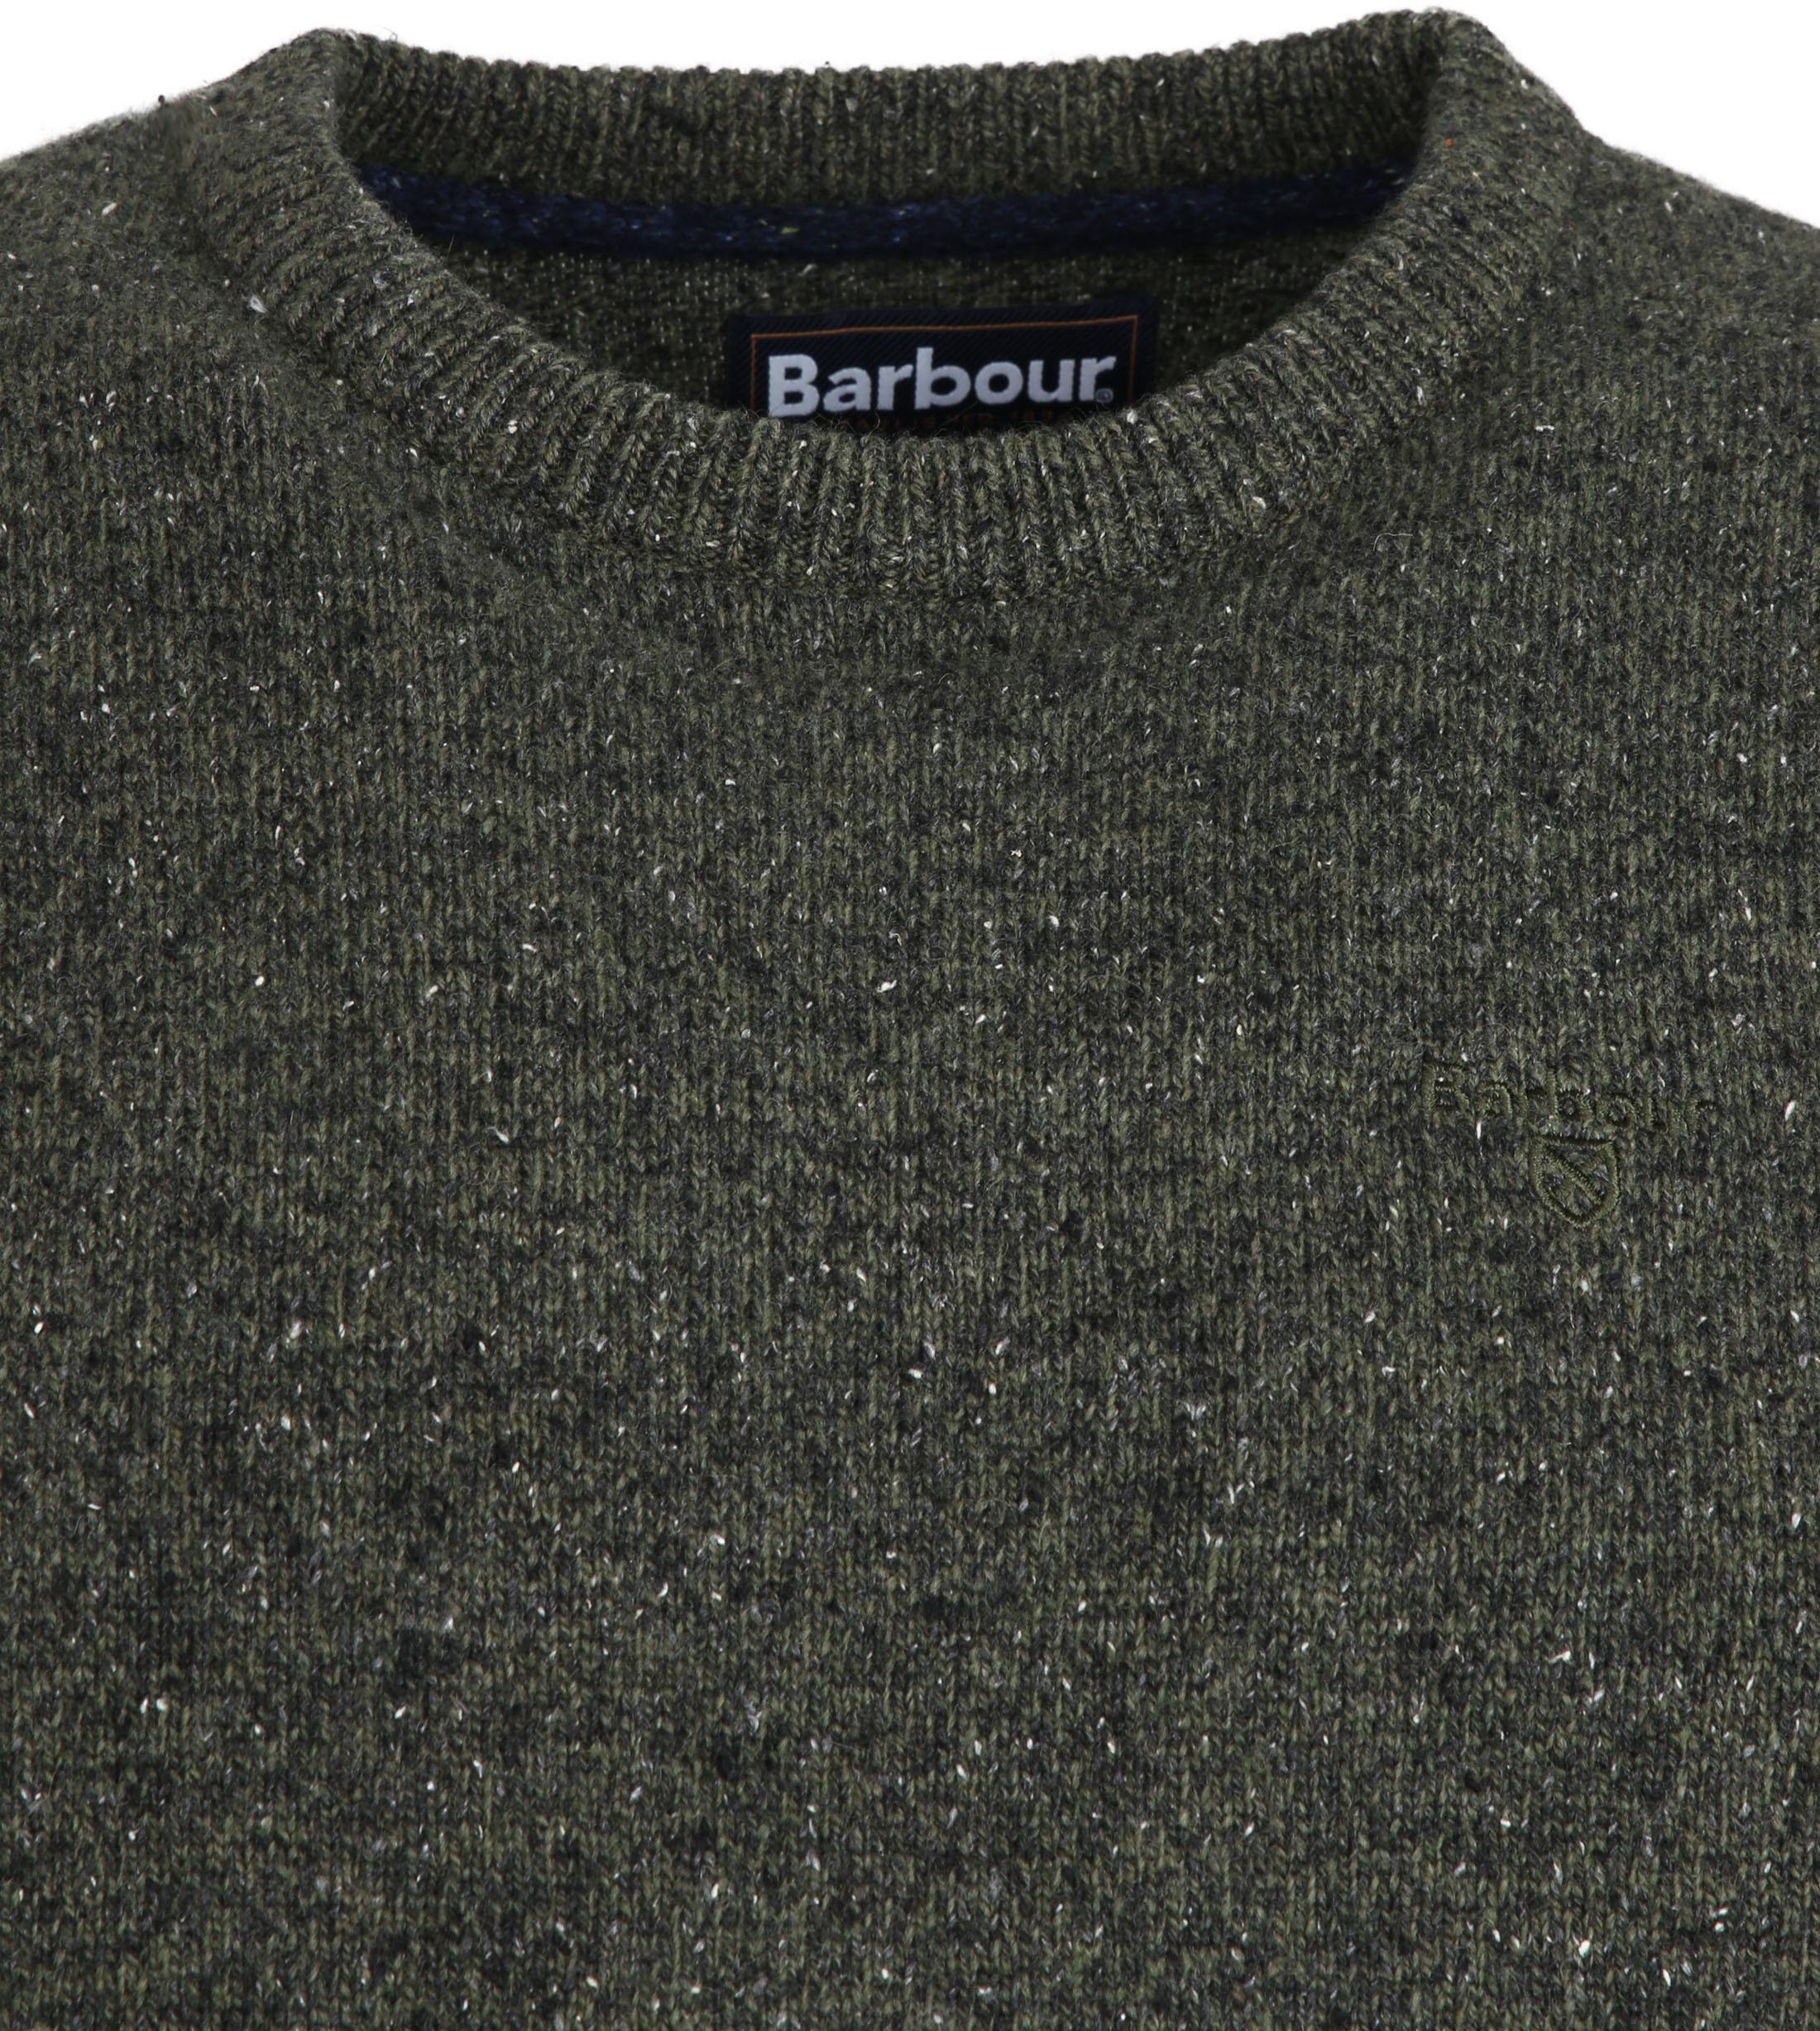 Barbour Tisbury Pullover Dark Green photo 1